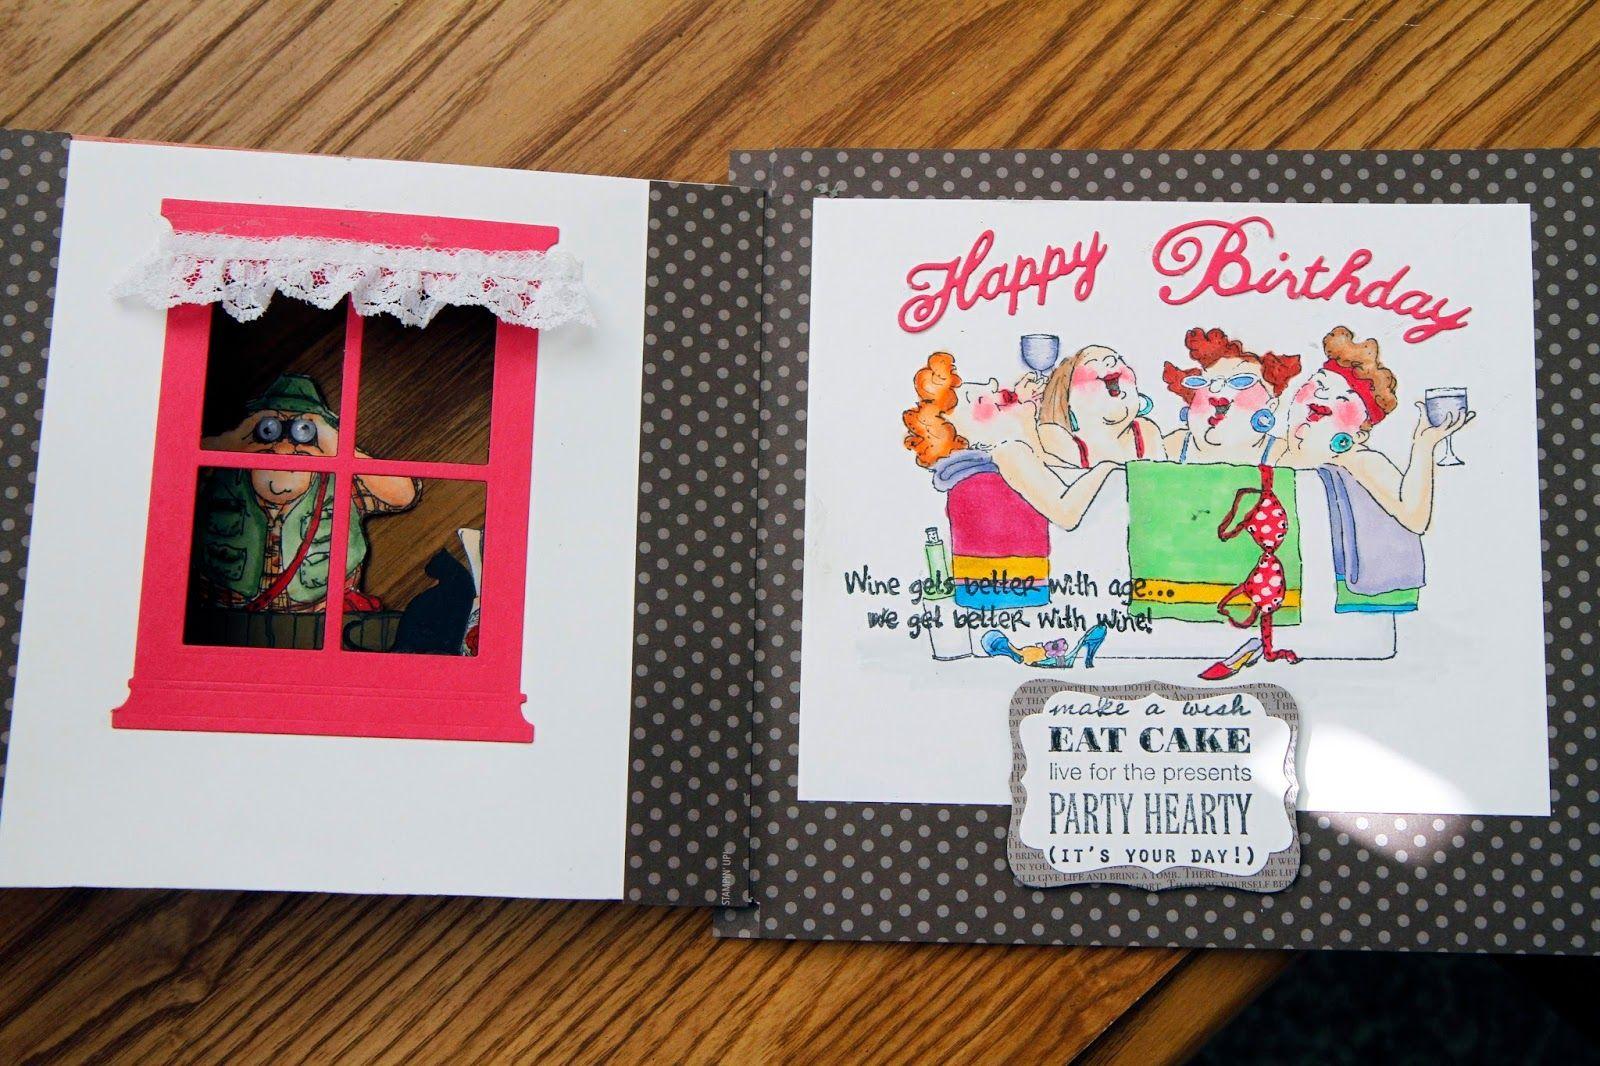 Art Impressions Ai Hollis - Front & Back (Sku#YY1901) Fence (Sku#P1499) In the Tub set of 4 (Sku#3570) Fanny Front & Back (Sku#T1716) Handmade birthday window girlfriends card. Inside of card.